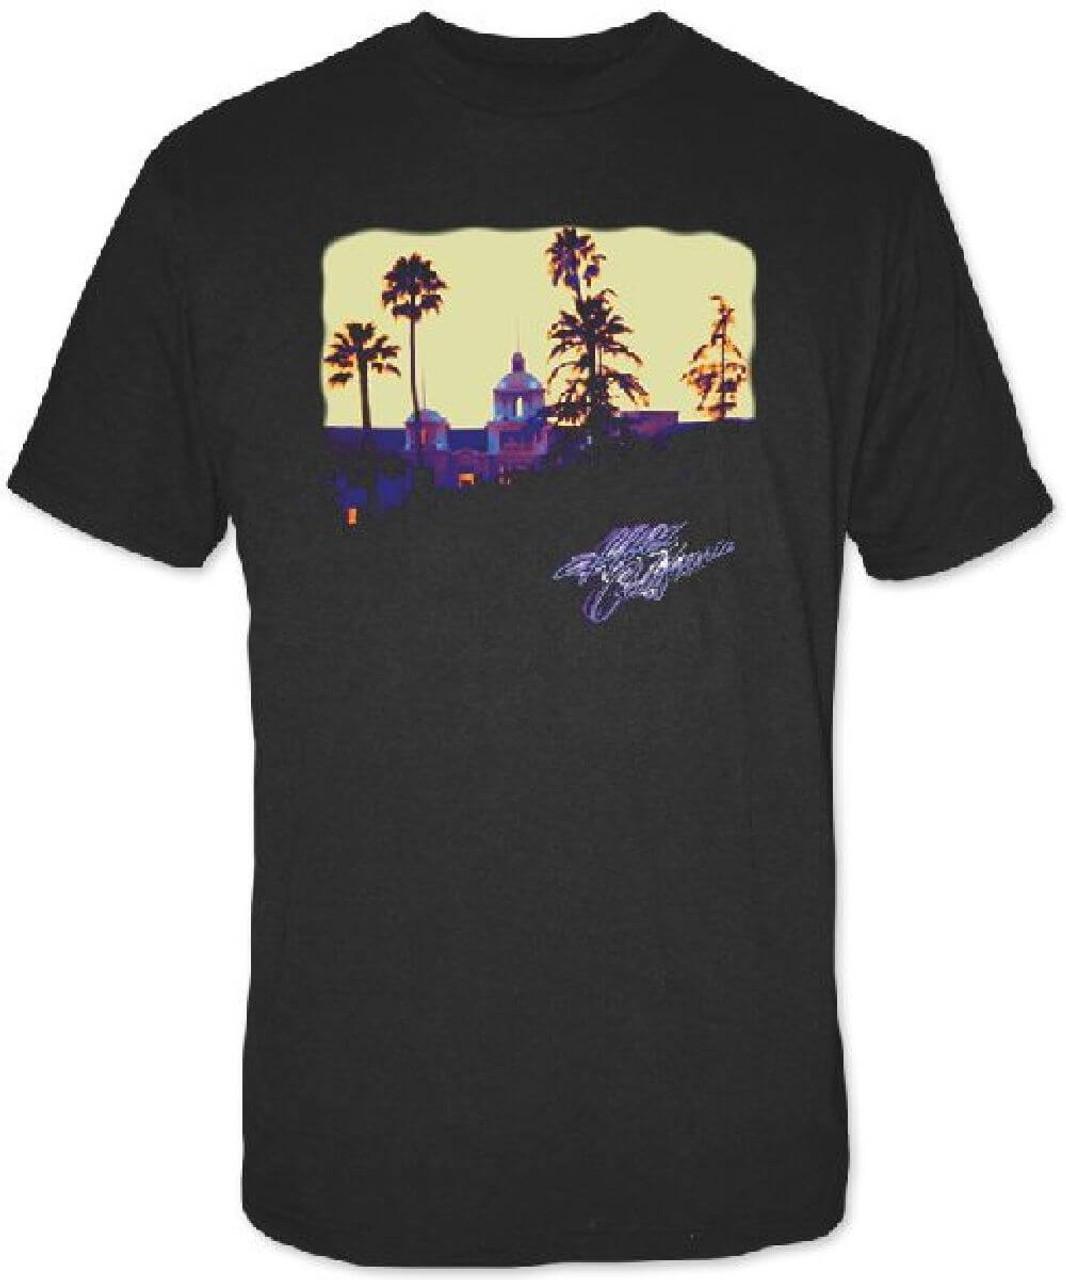 6d6e085826ec Eagles Hotel California Album Cover Artwork Men s Black T-shirt ...